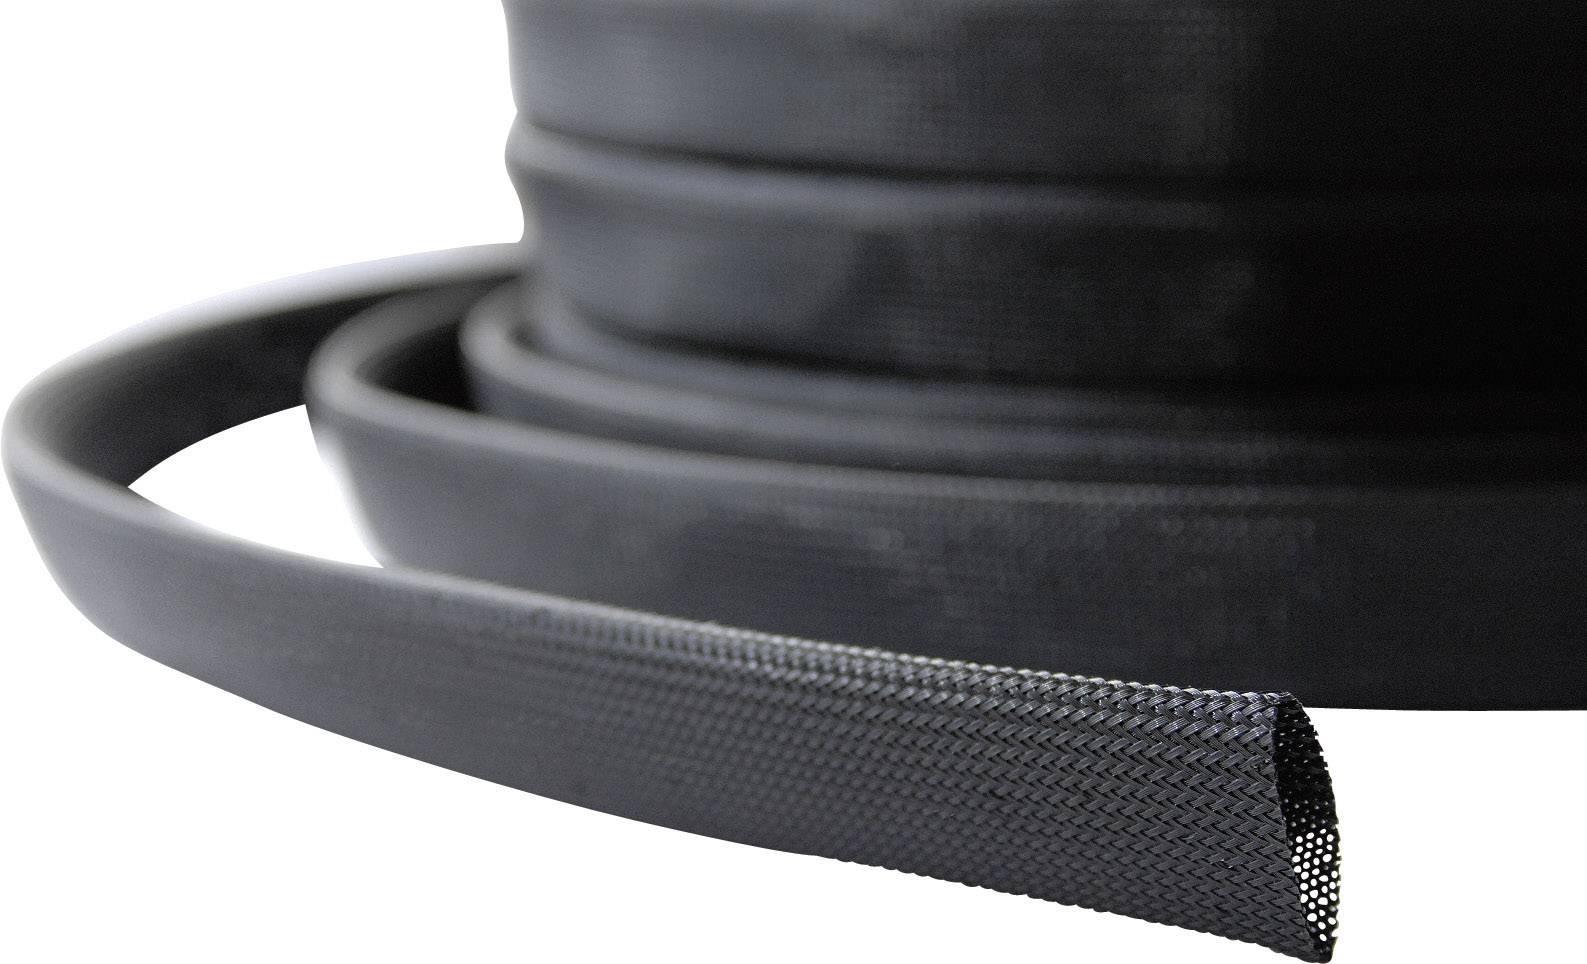 Ochranný oplet LappKabel SILVYN® BRAID PA6 NW, 32 do 44 mm, -55 do +125 °C, 5 m, čierna